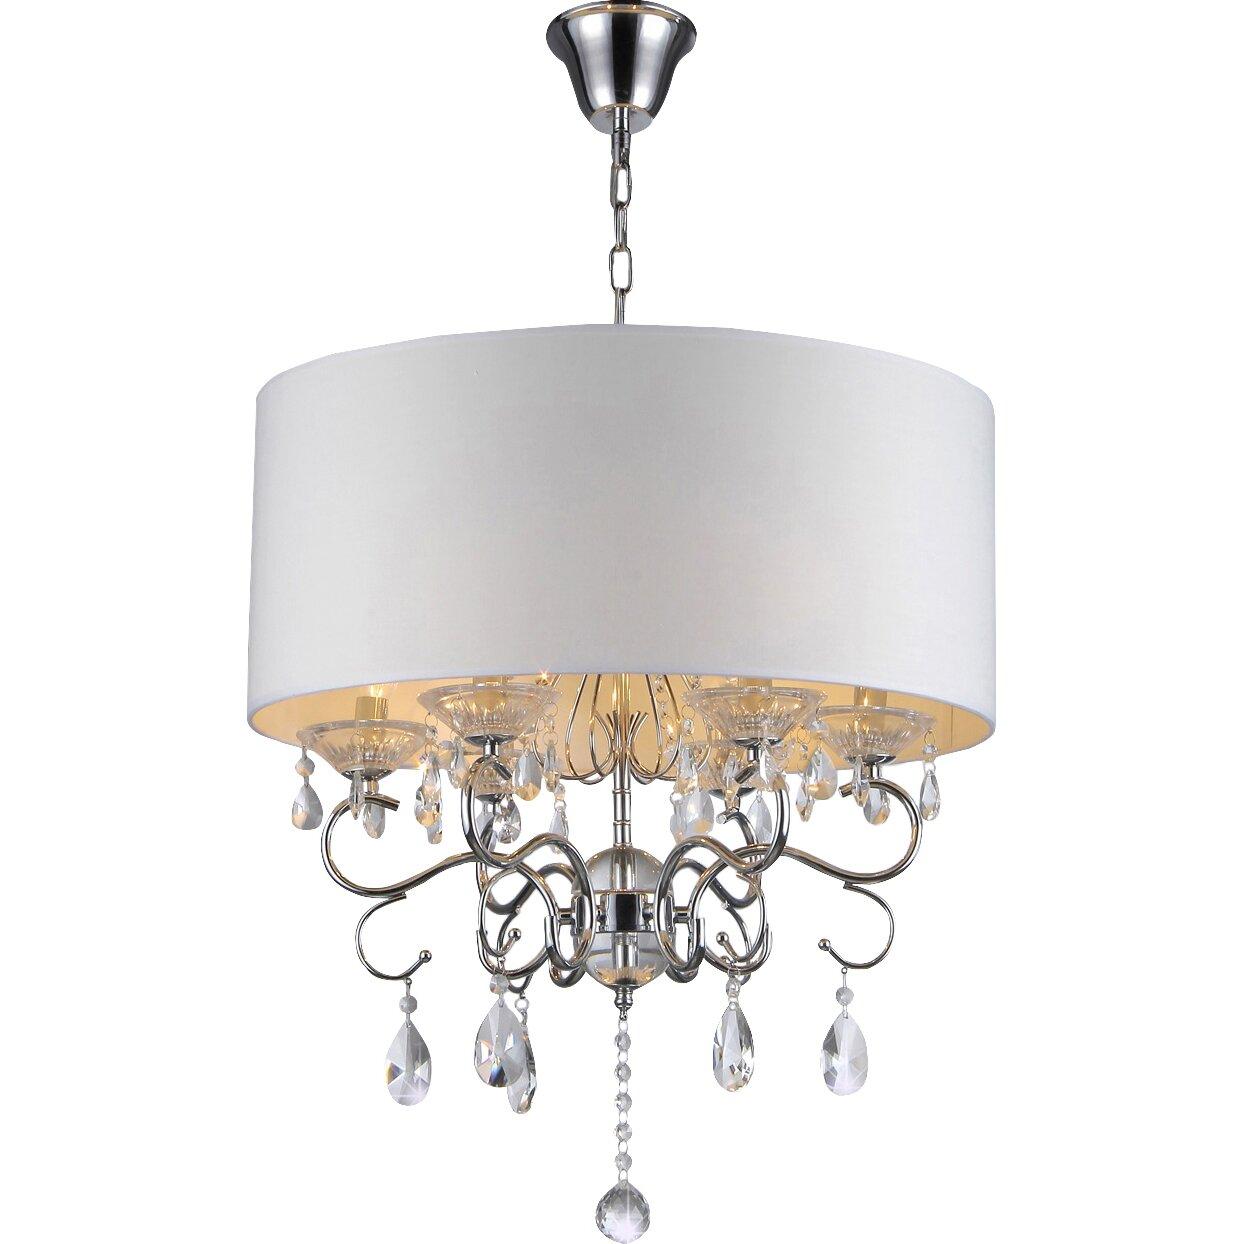 6 Light Crystal Chandelier